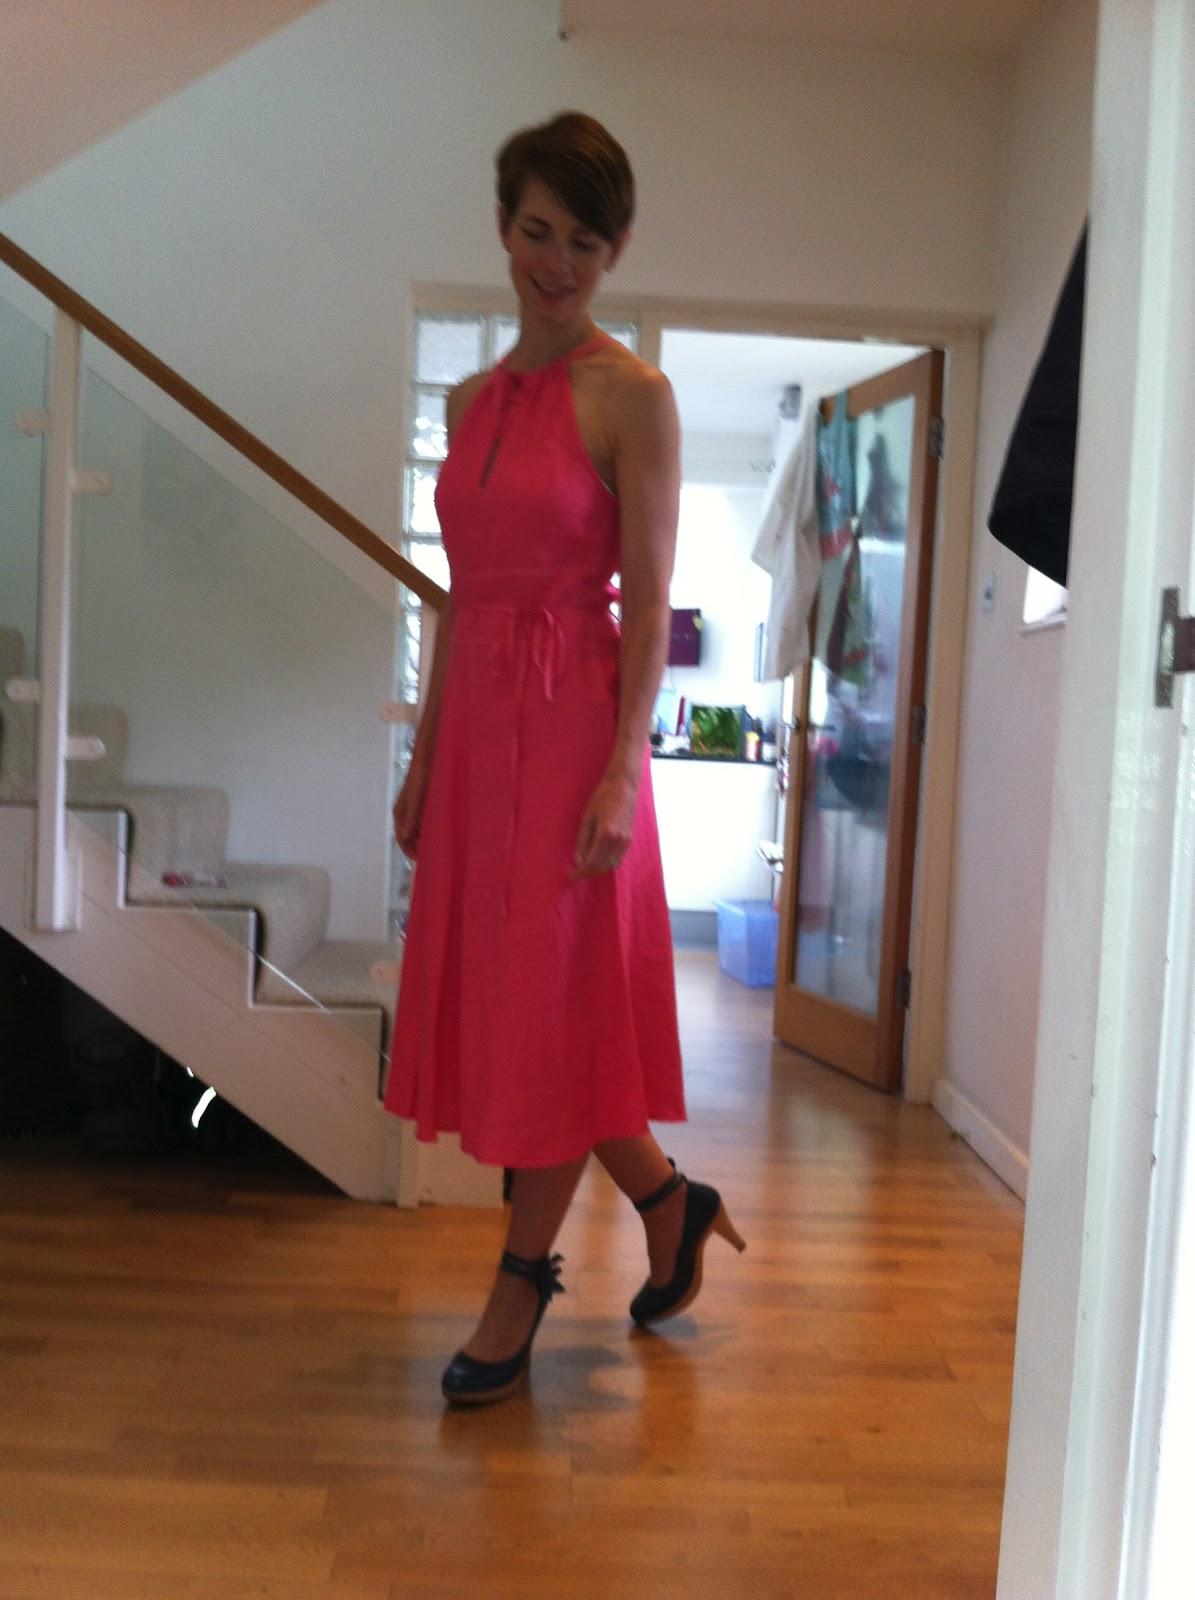 http://4.bp.blogspot.com/-paPE_pK7psw/UA18yEAmOUI/AAAAAAAACuI/h6GnFZeSxXI/s1600/oasis+dress+017.JPG